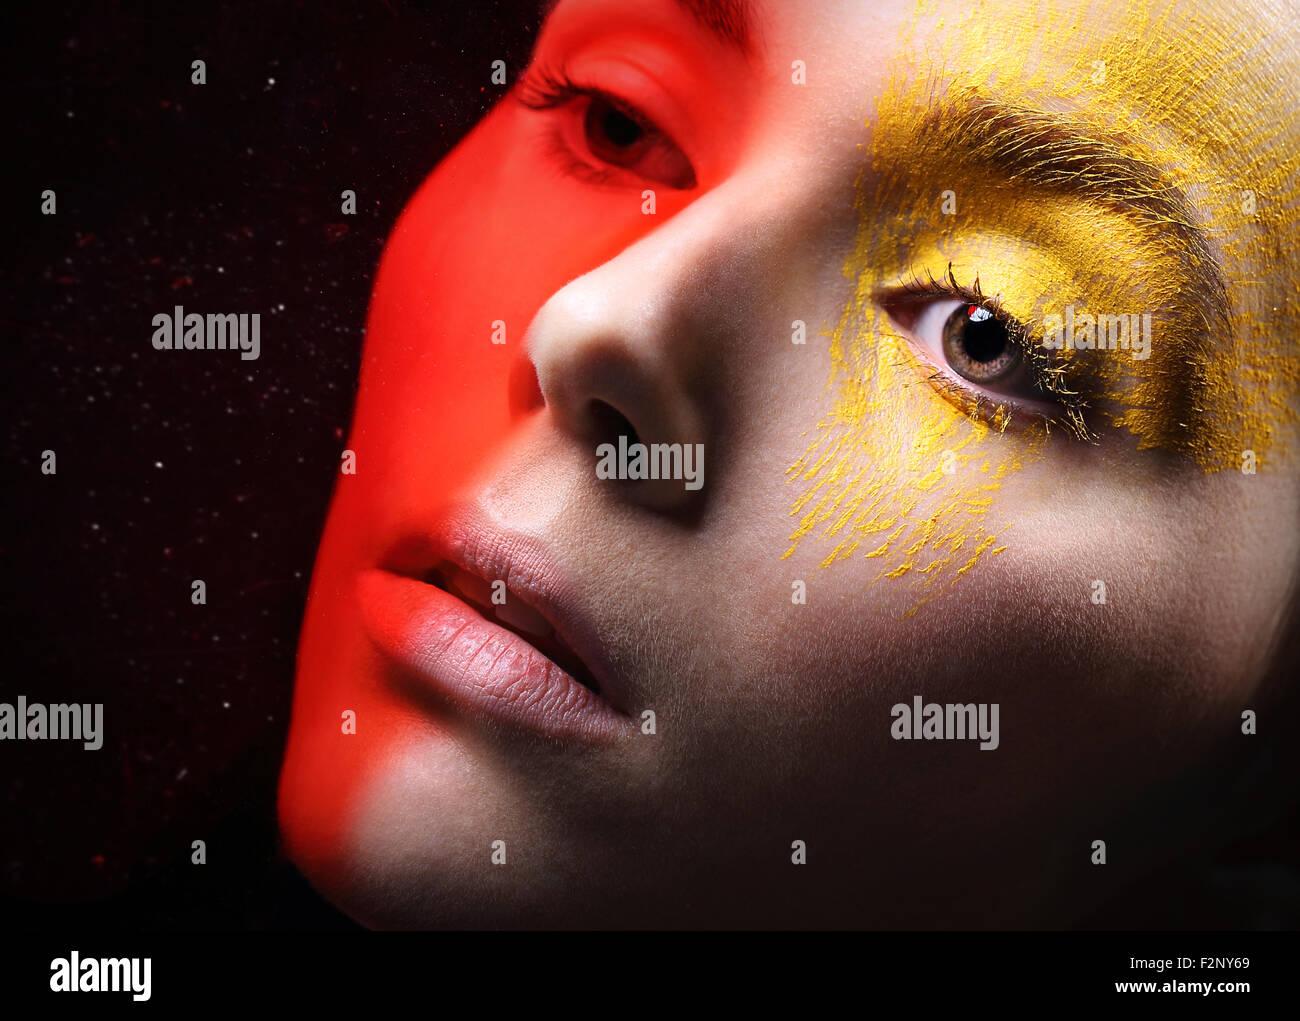 make-up, makeup, characterization, colorful makeup, disguise, fancy make-up, makeup artist,  artistic makeup, fantasy, - Stock Image